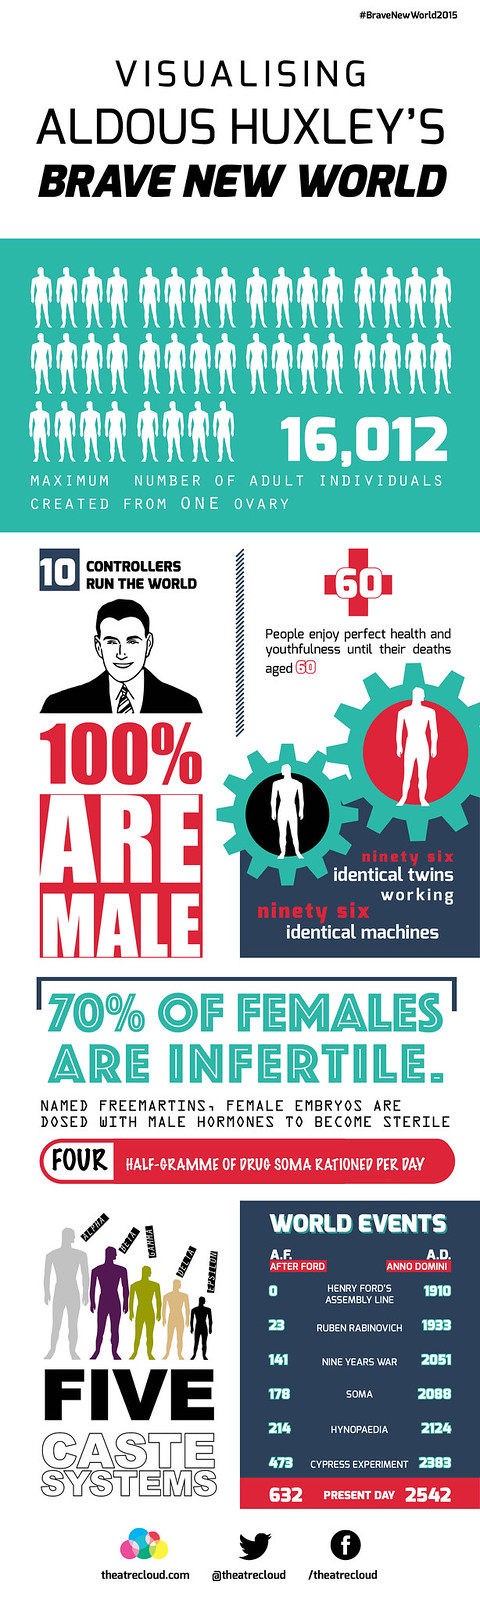 Infographic Visualising Brave New World News Theatre Cloud